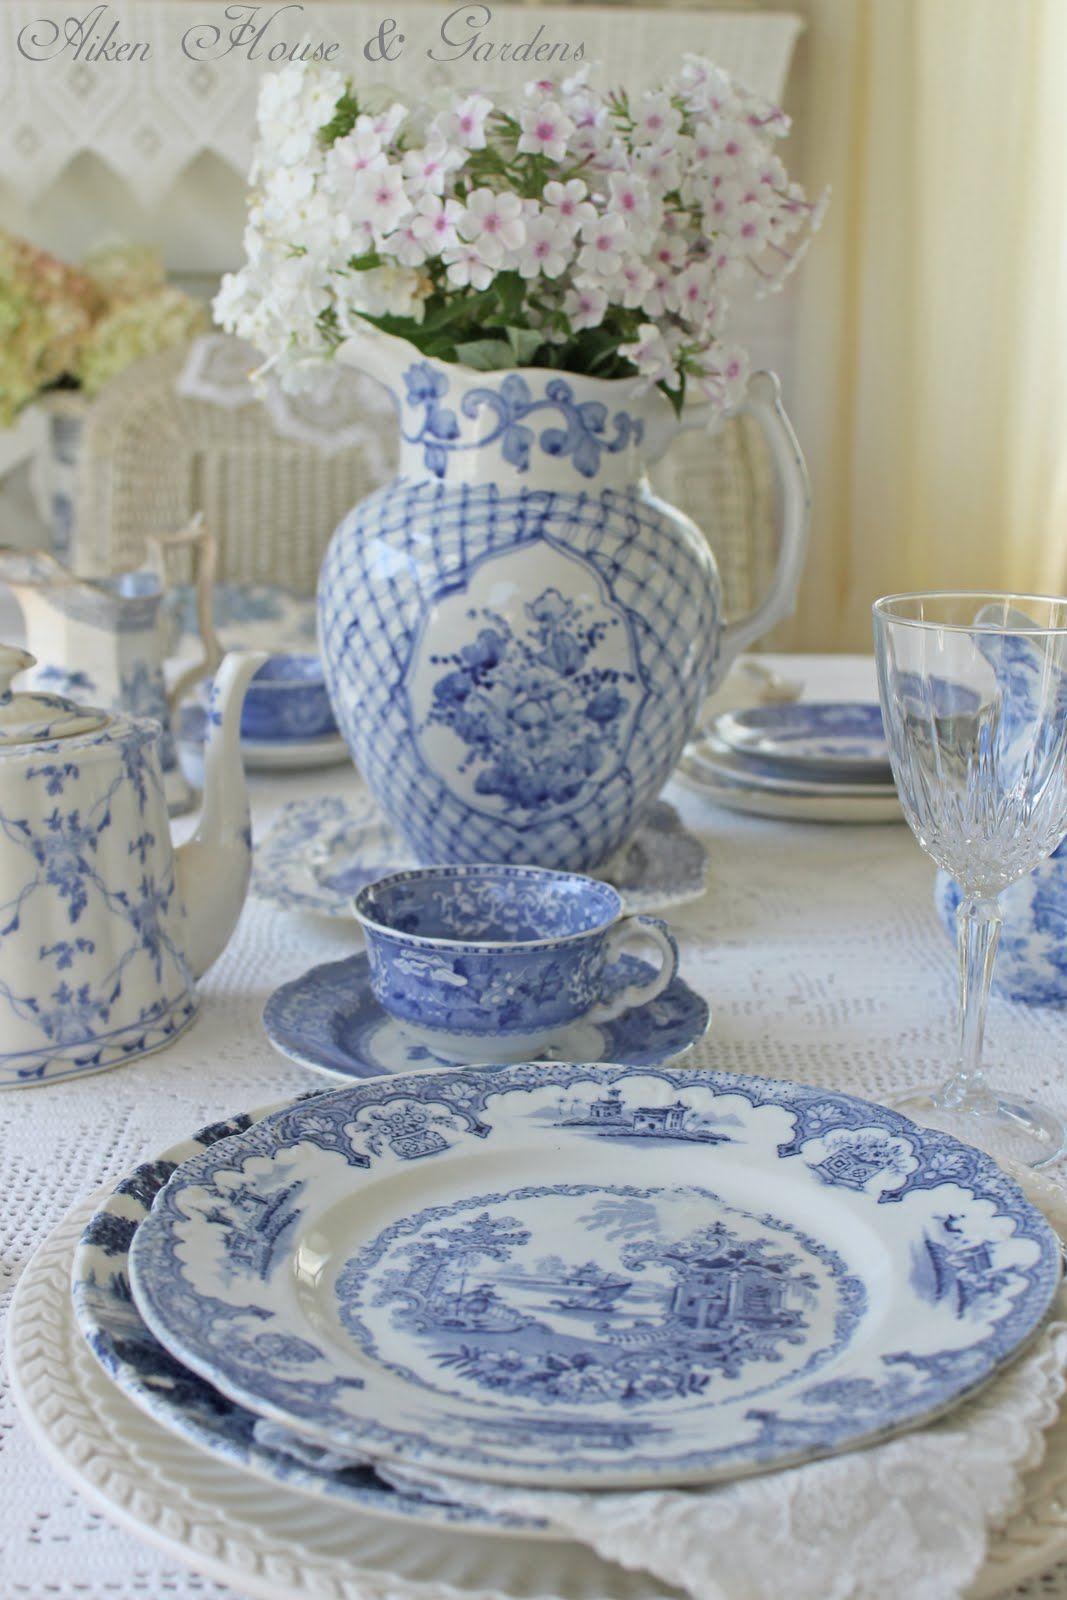 aiken house gardens blue white transferware tablescape porzellan pinterest blau und. Black Bedroom Furniture Sets. Home Design Ideas